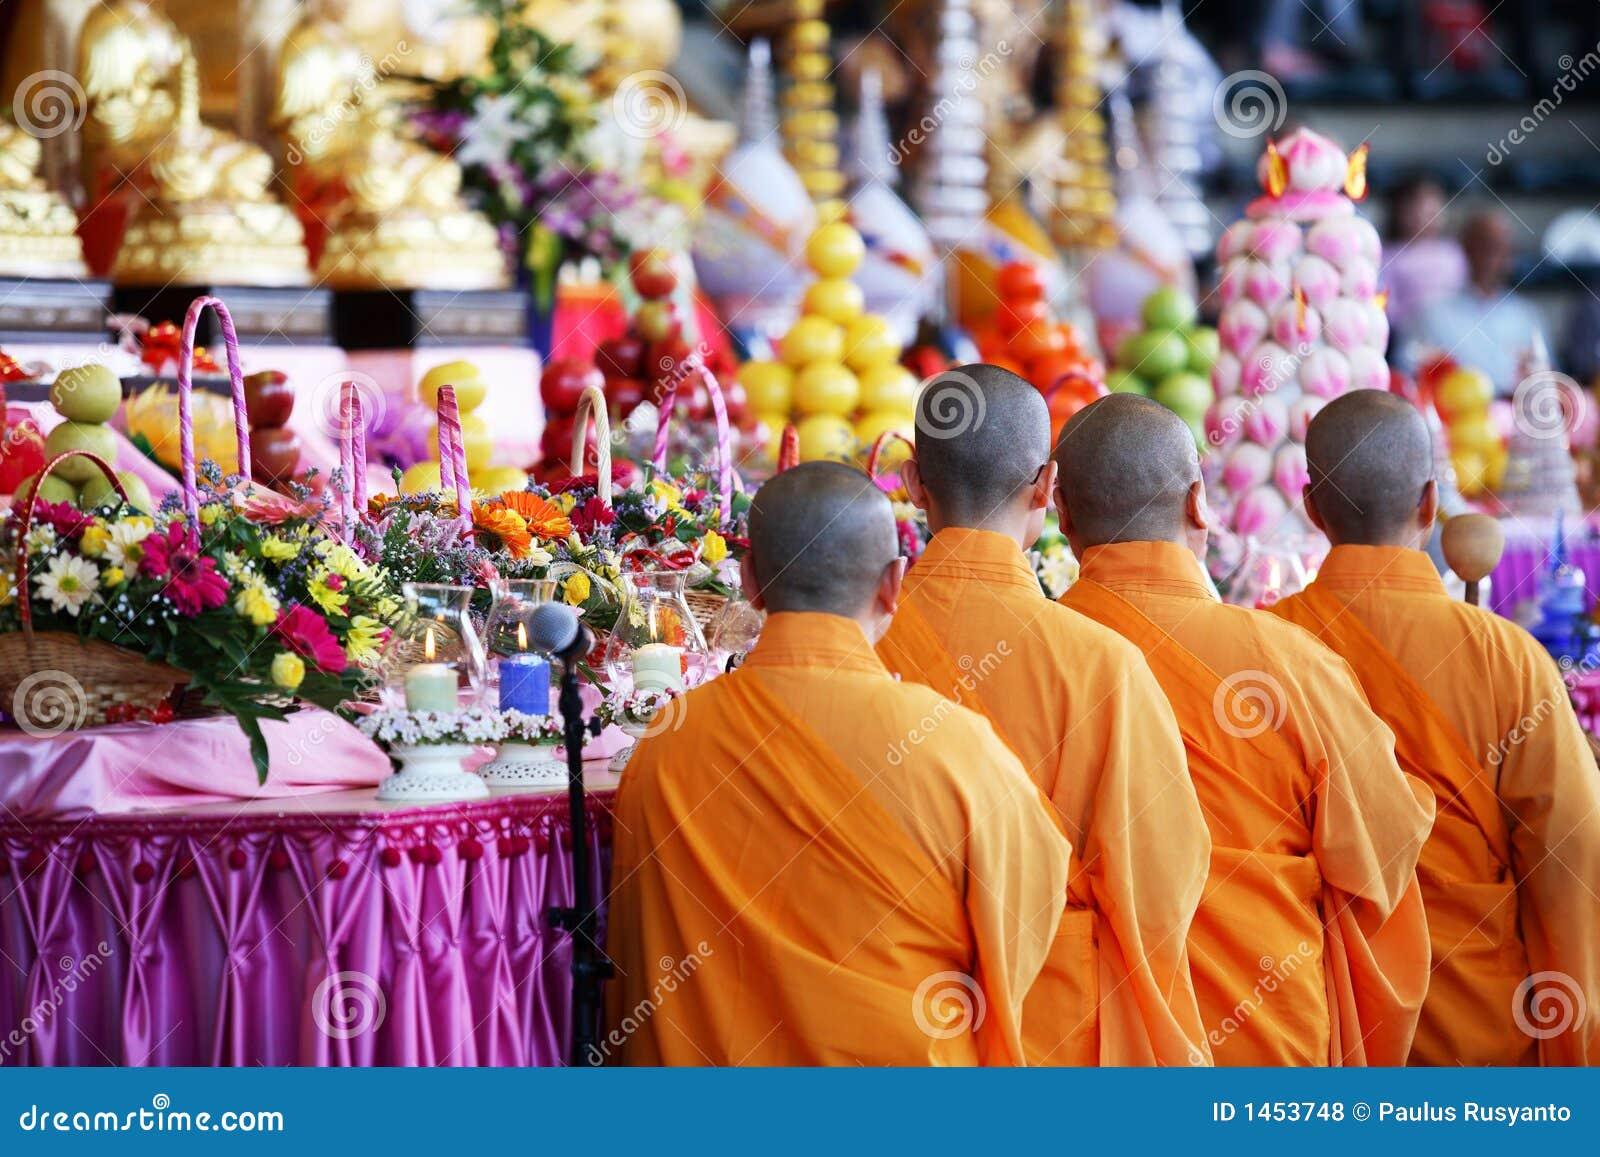 Monges santamente